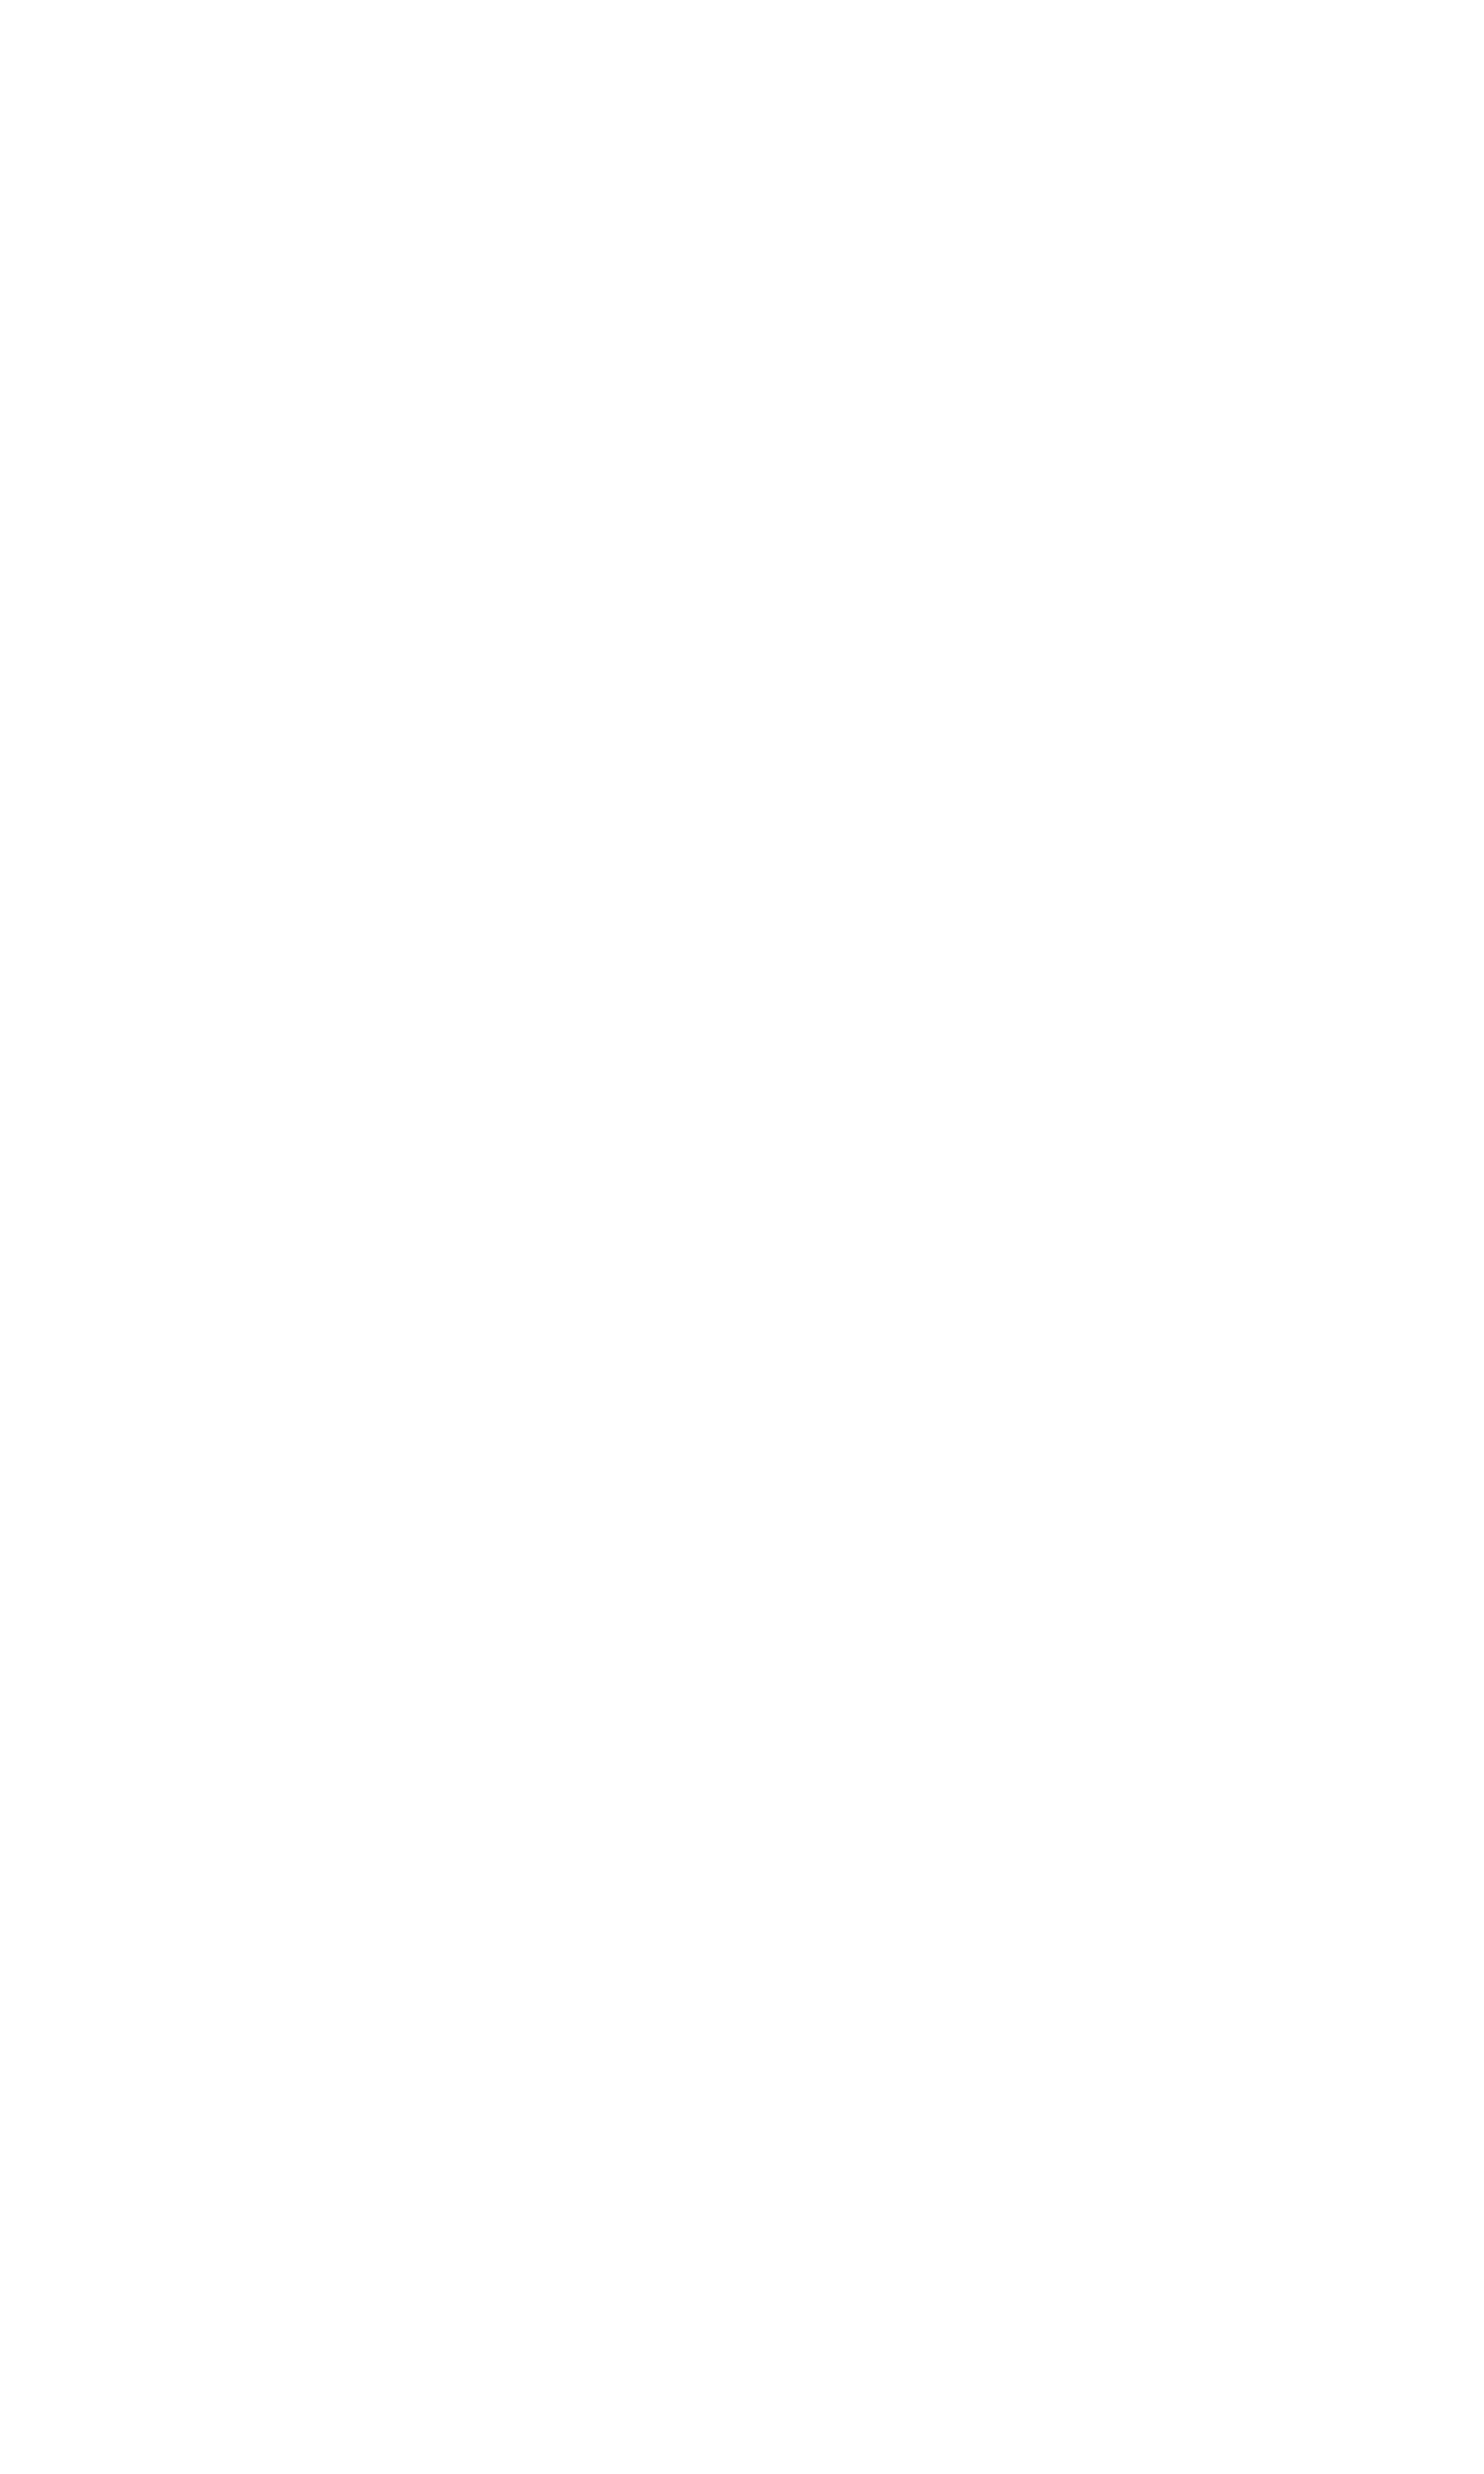 Testimonials-web3.png